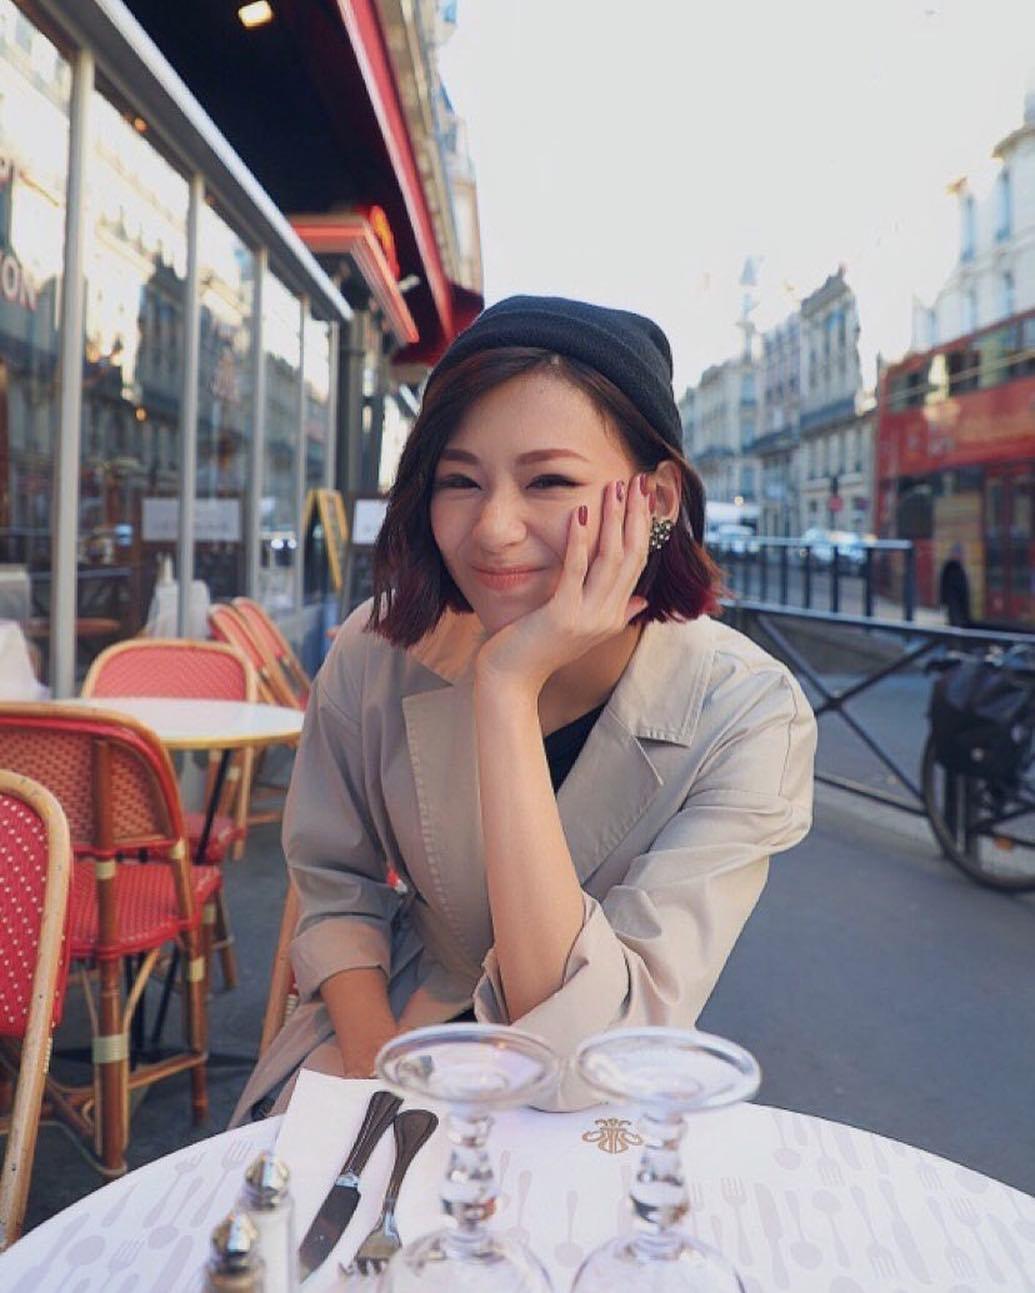 Ảnh: Instagram @mariya_nishiuchi_official